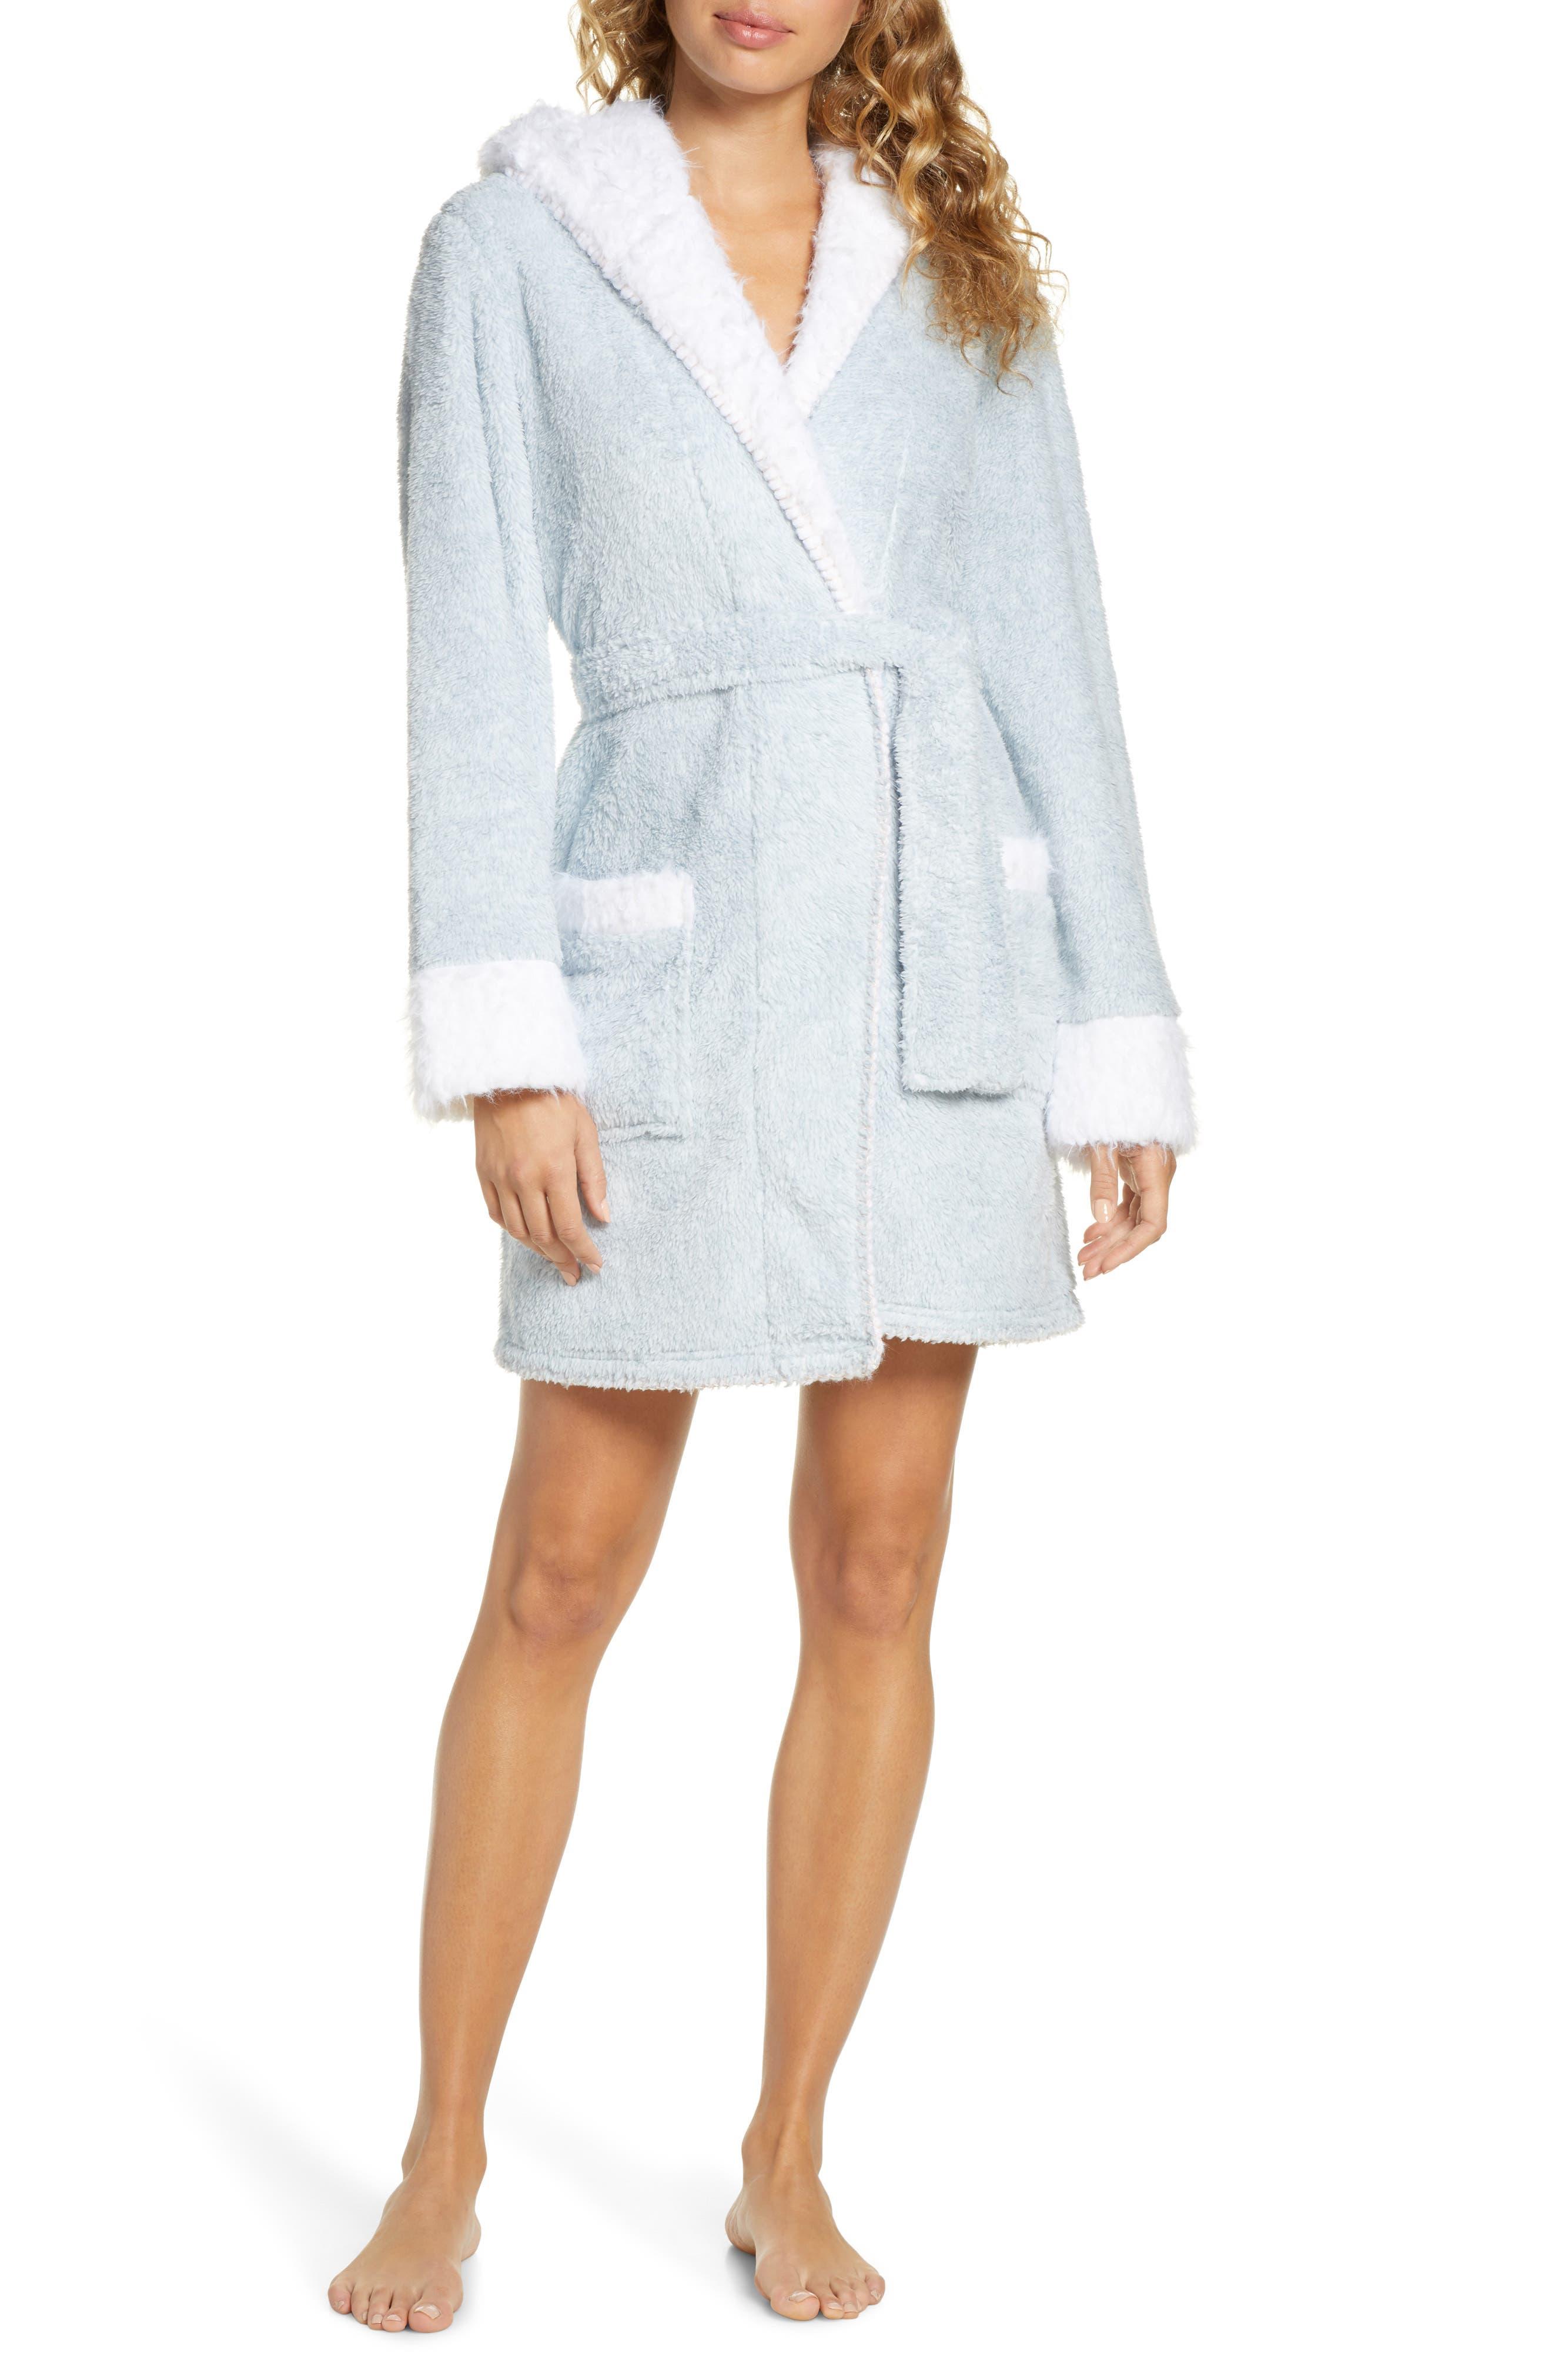 Image of Honeydew Intimates All Ears Hooded Plush Fleece Short Robe